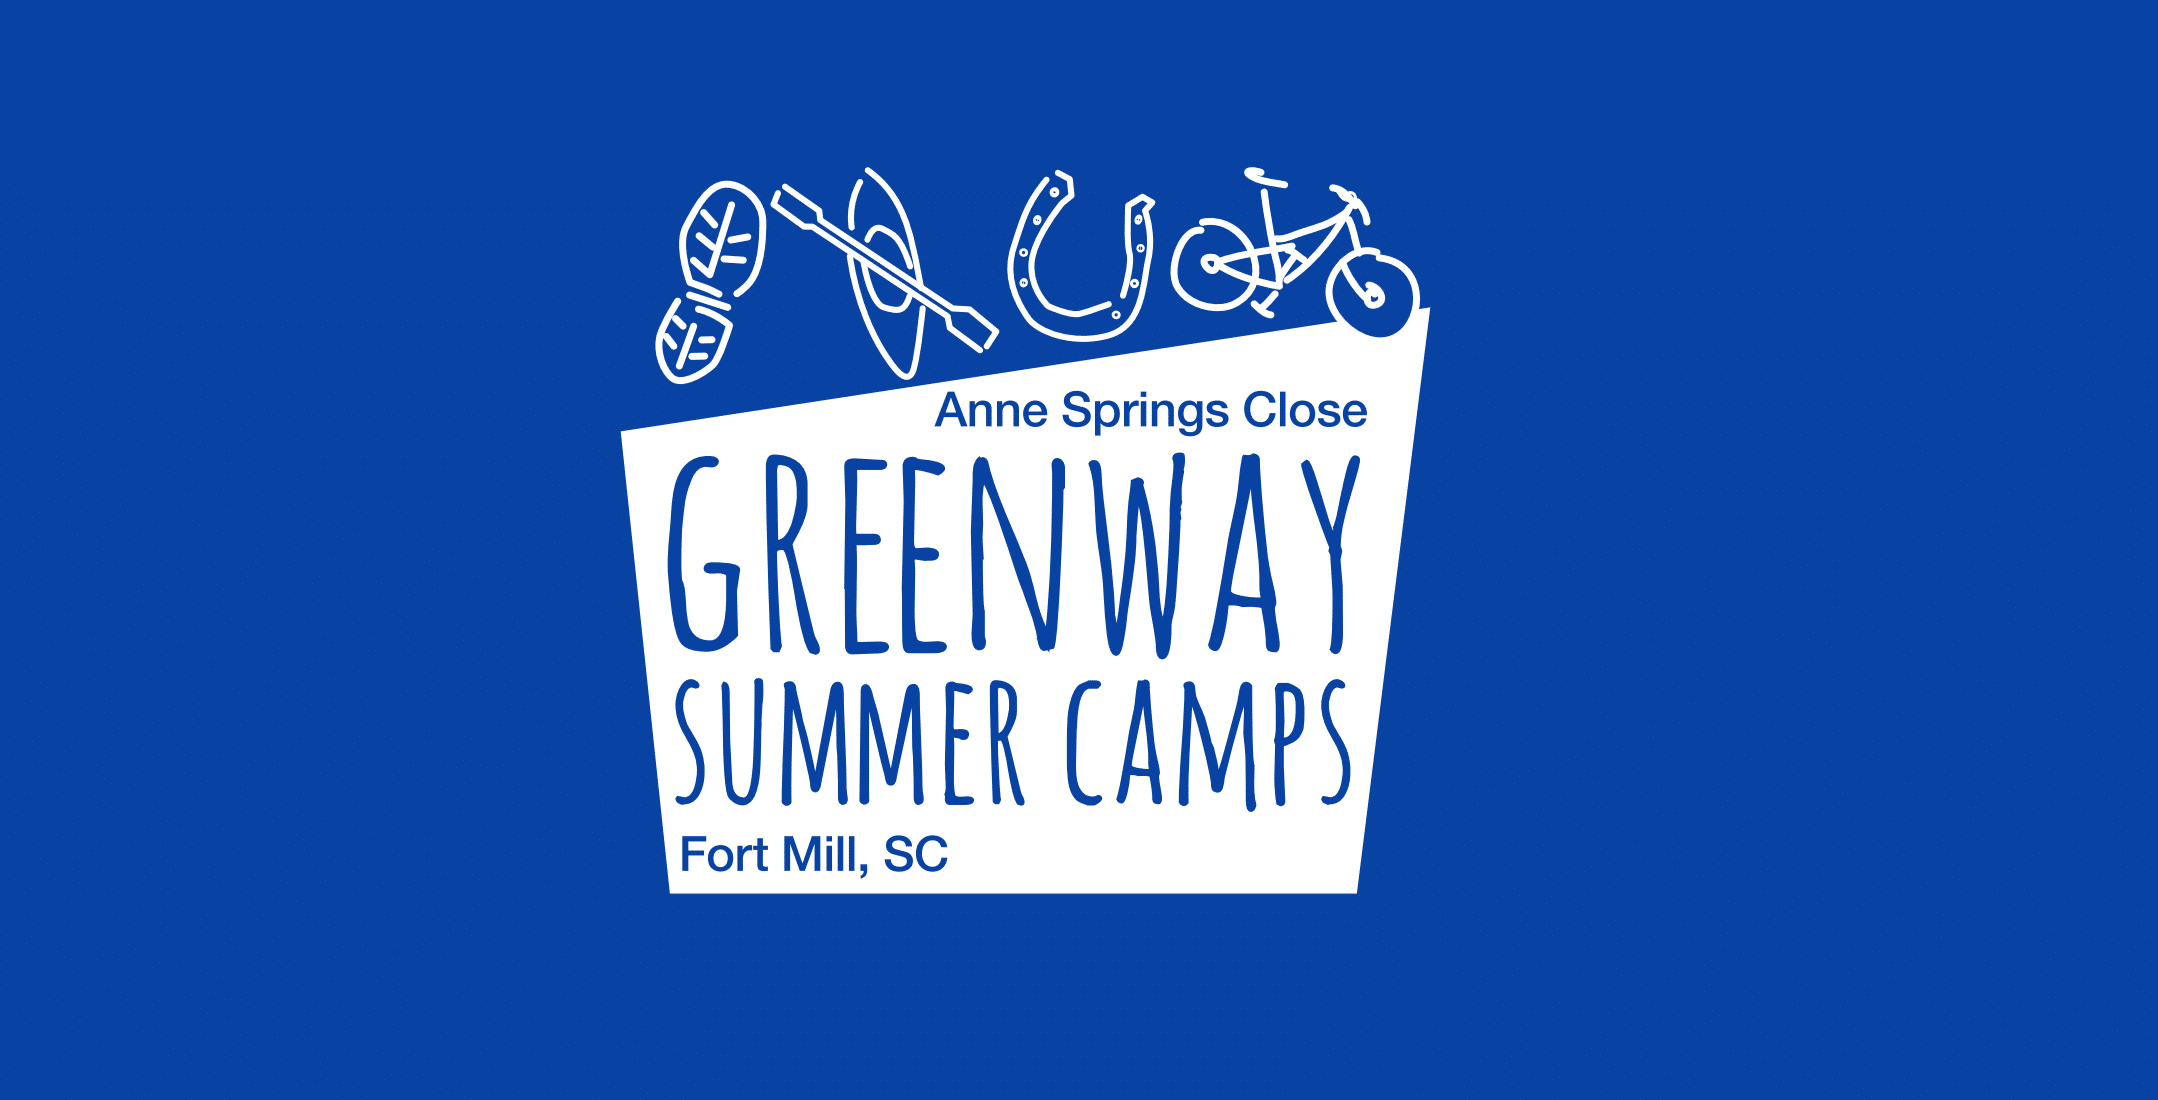 Greenway Summer Camps logo